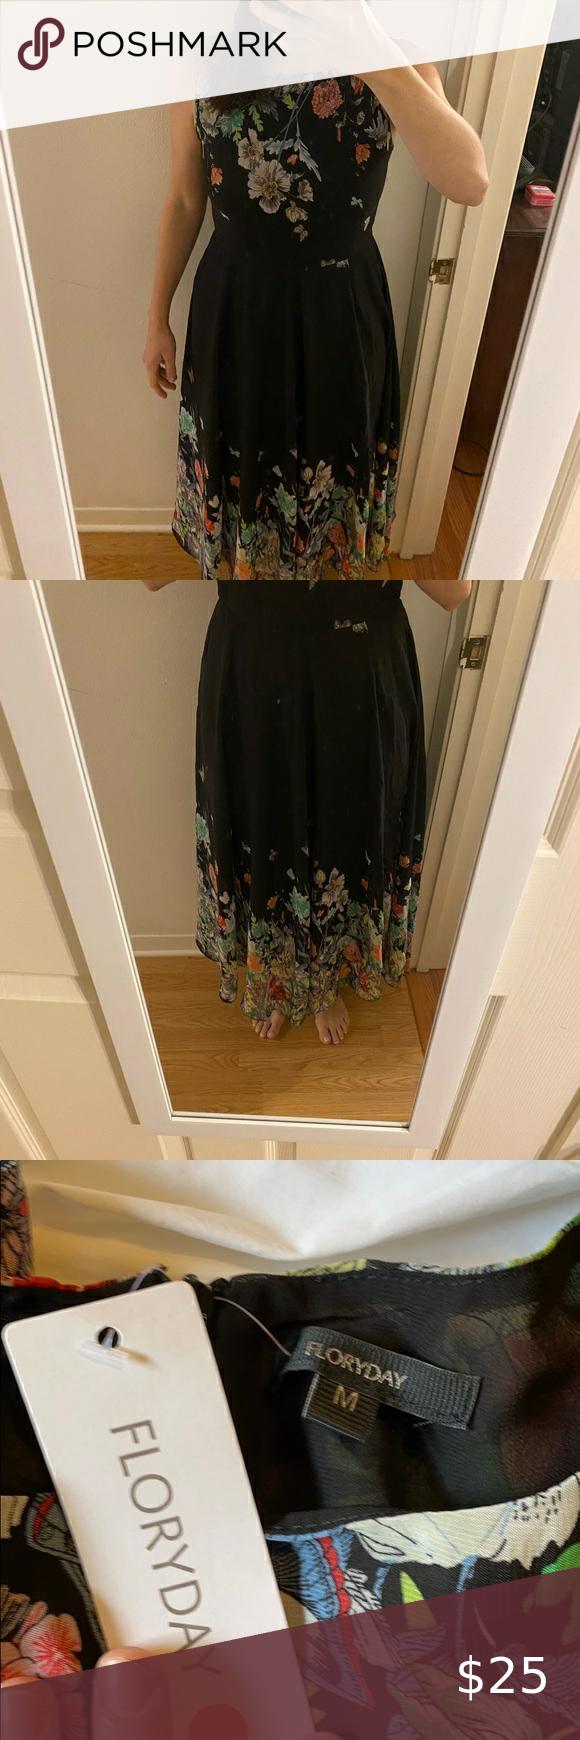 Black Midi Dress With Flowers And Butterflies Black Midi Dress Yellow Lace Dresses Long Sleeve Mini Dress [ 1740 x 580 Pixel ]